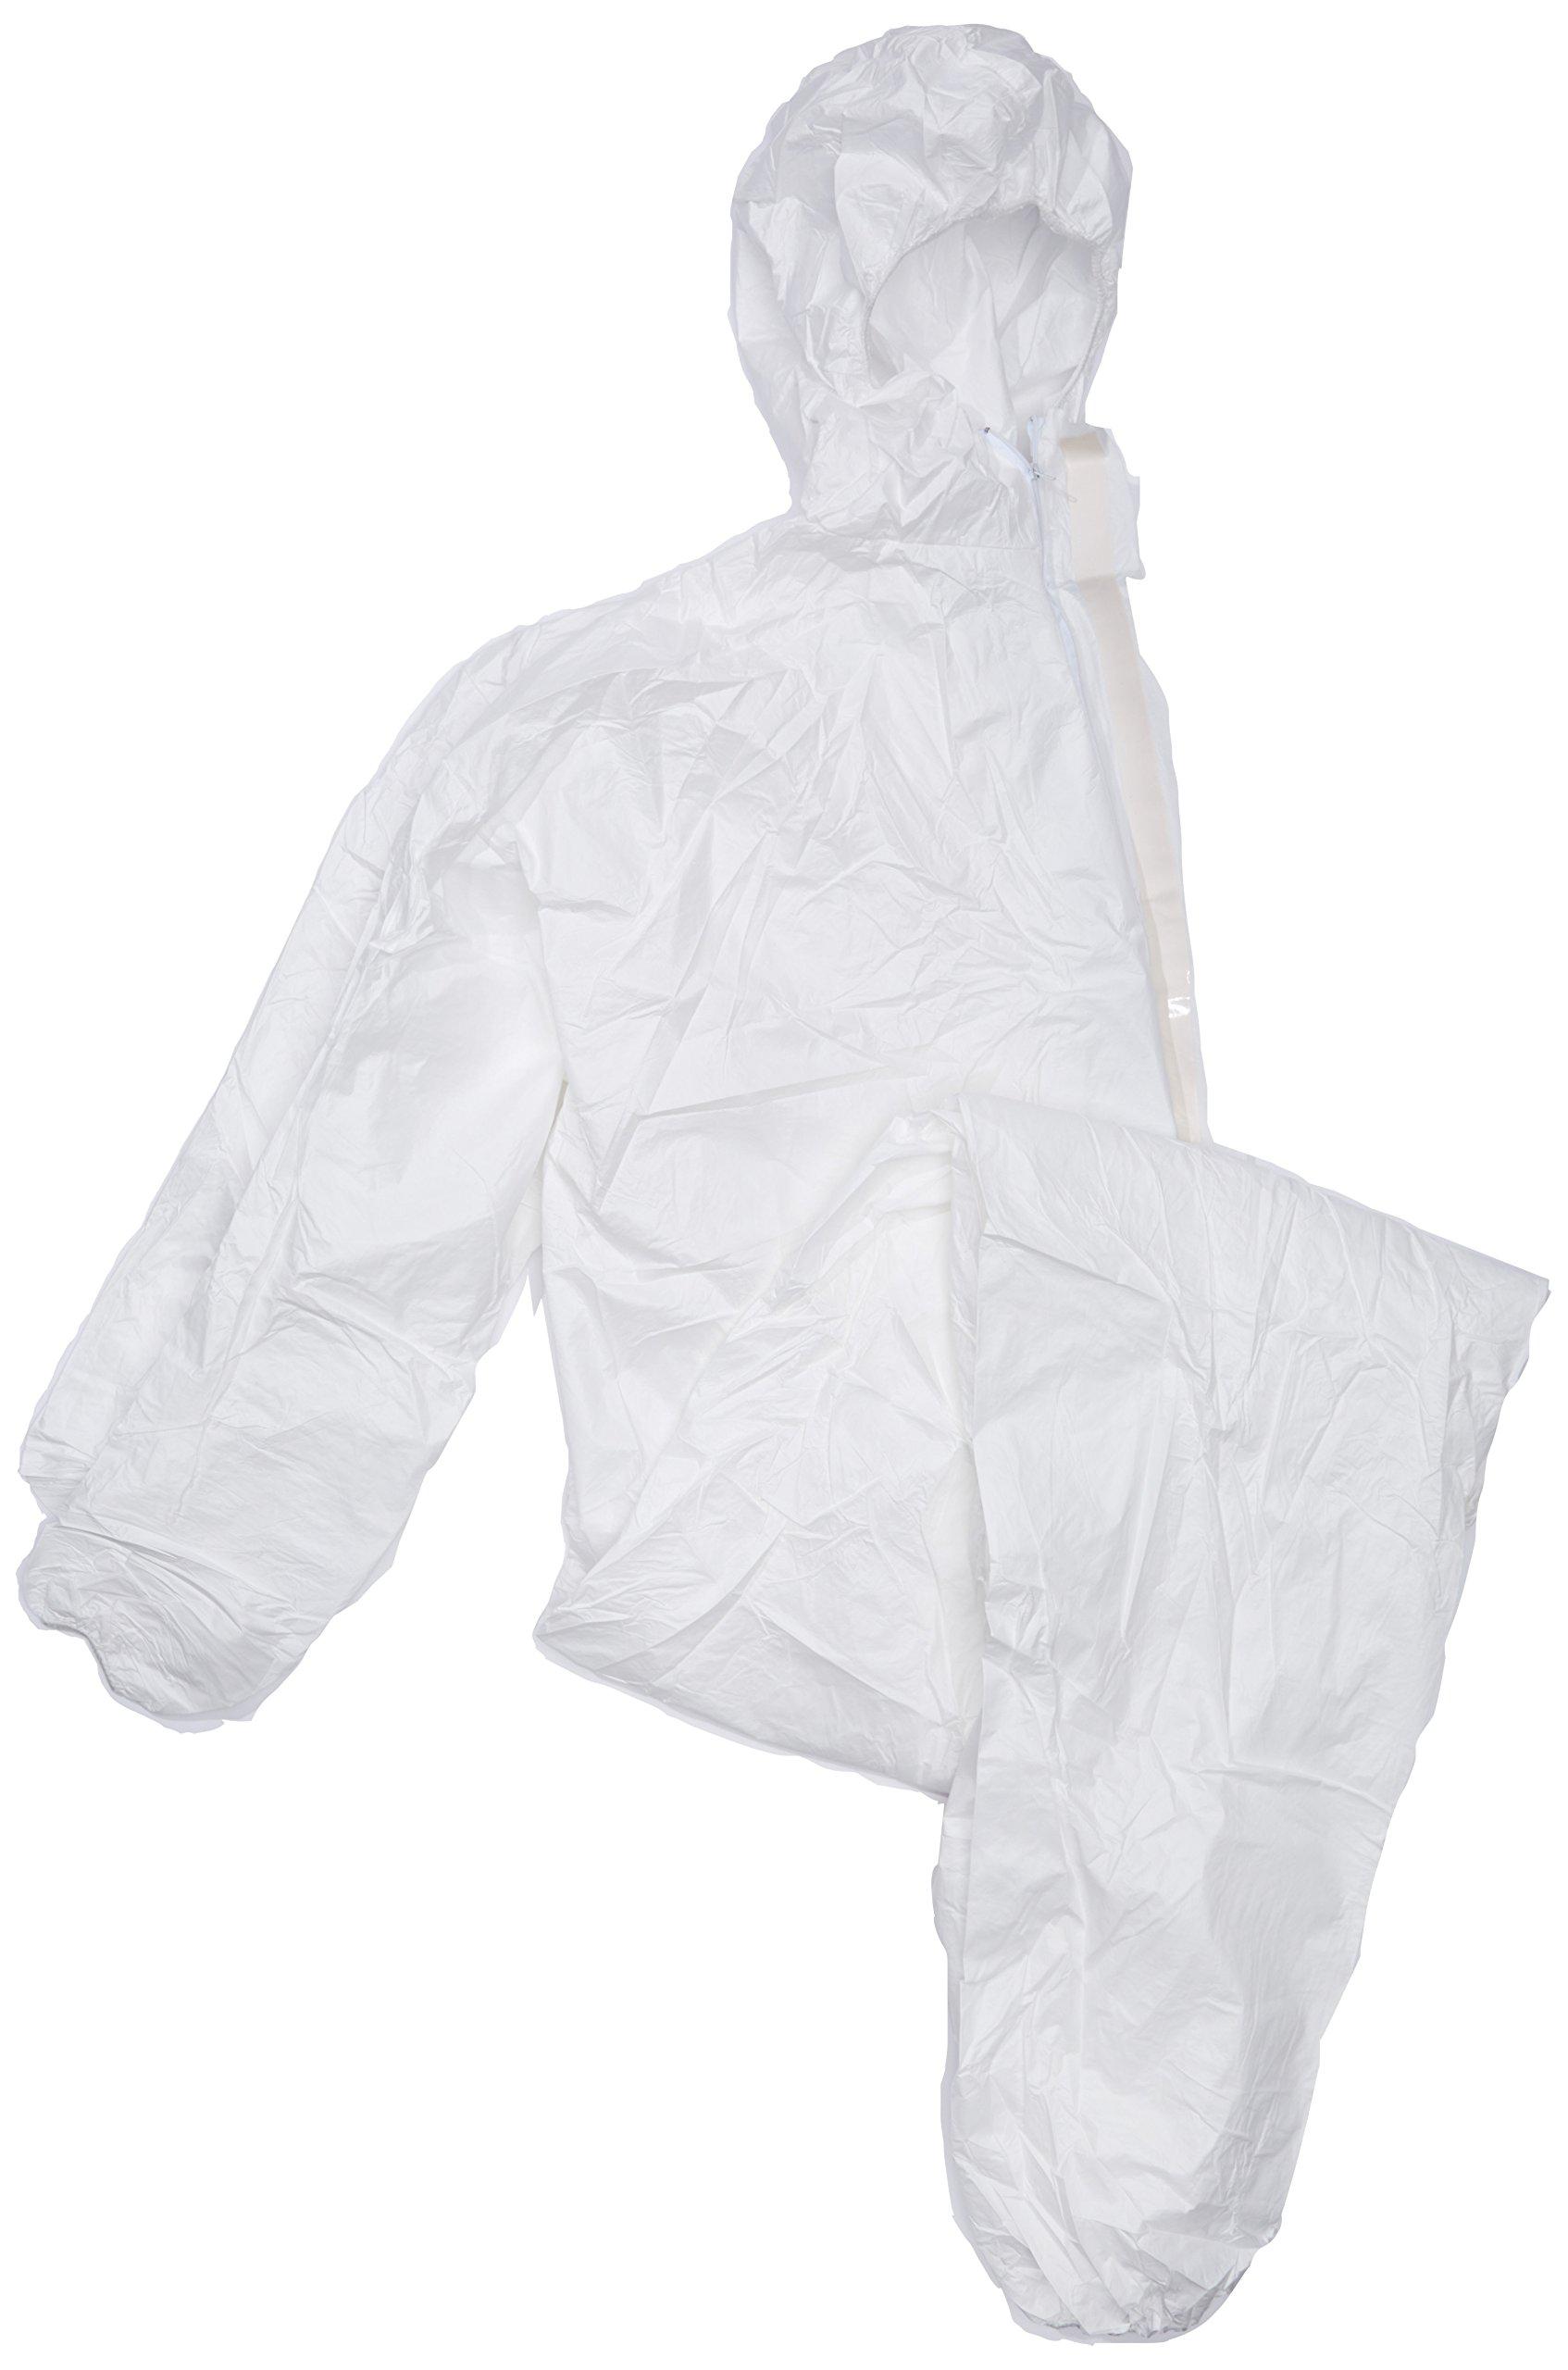 Florida Coast 44-1400 Virus & Disease Protective Wear Coveralls,, Extra Large,, White